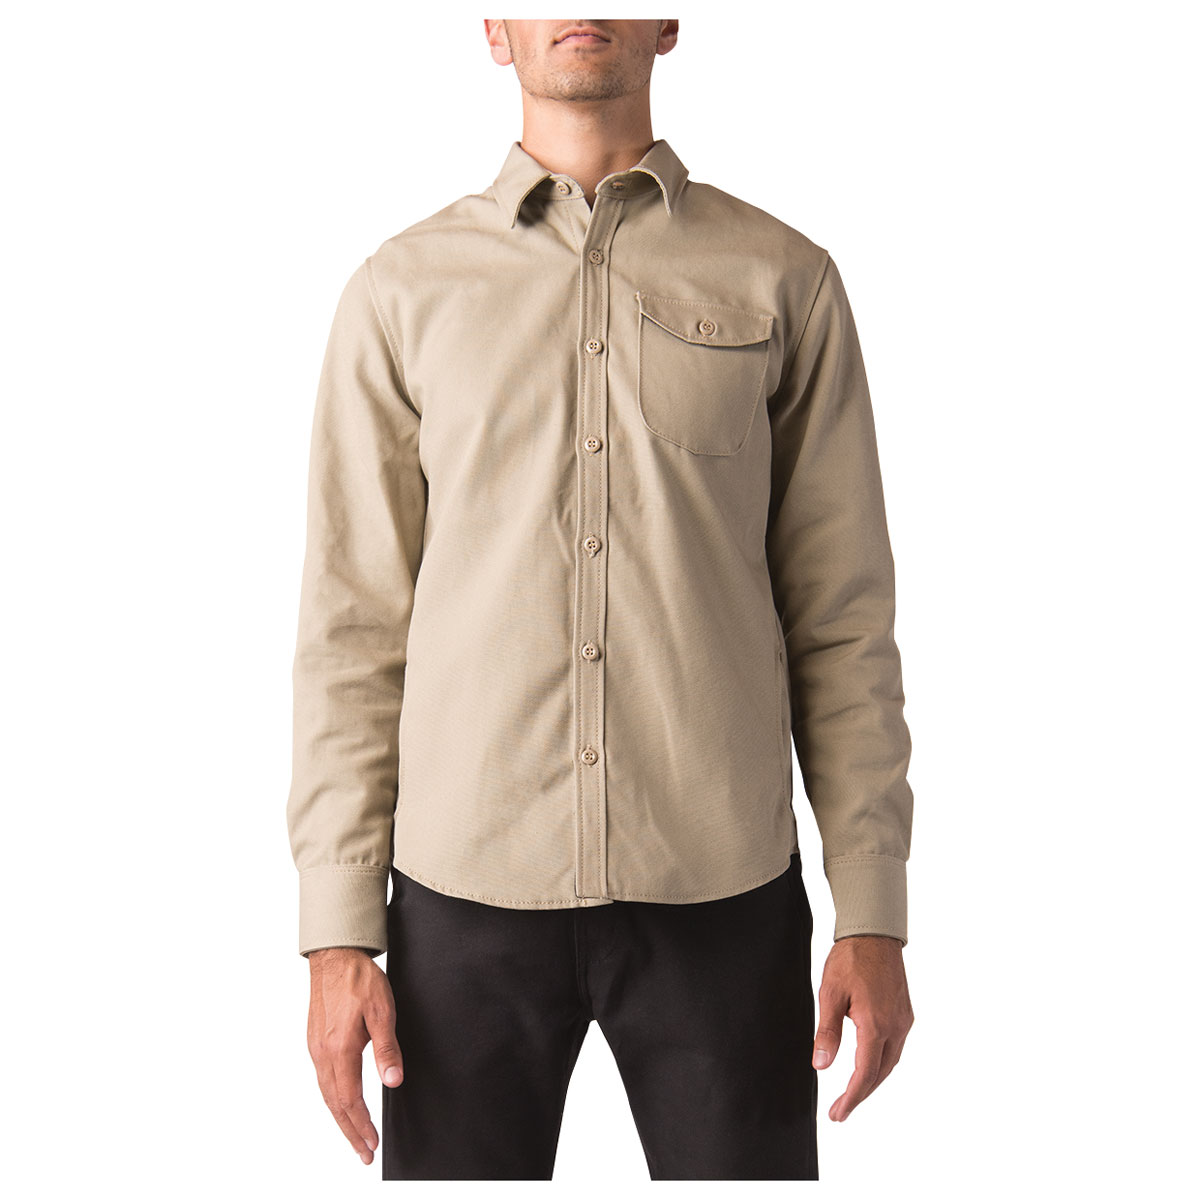 Dickies Moto Men's Iron Cloth Khaki Work Shirt